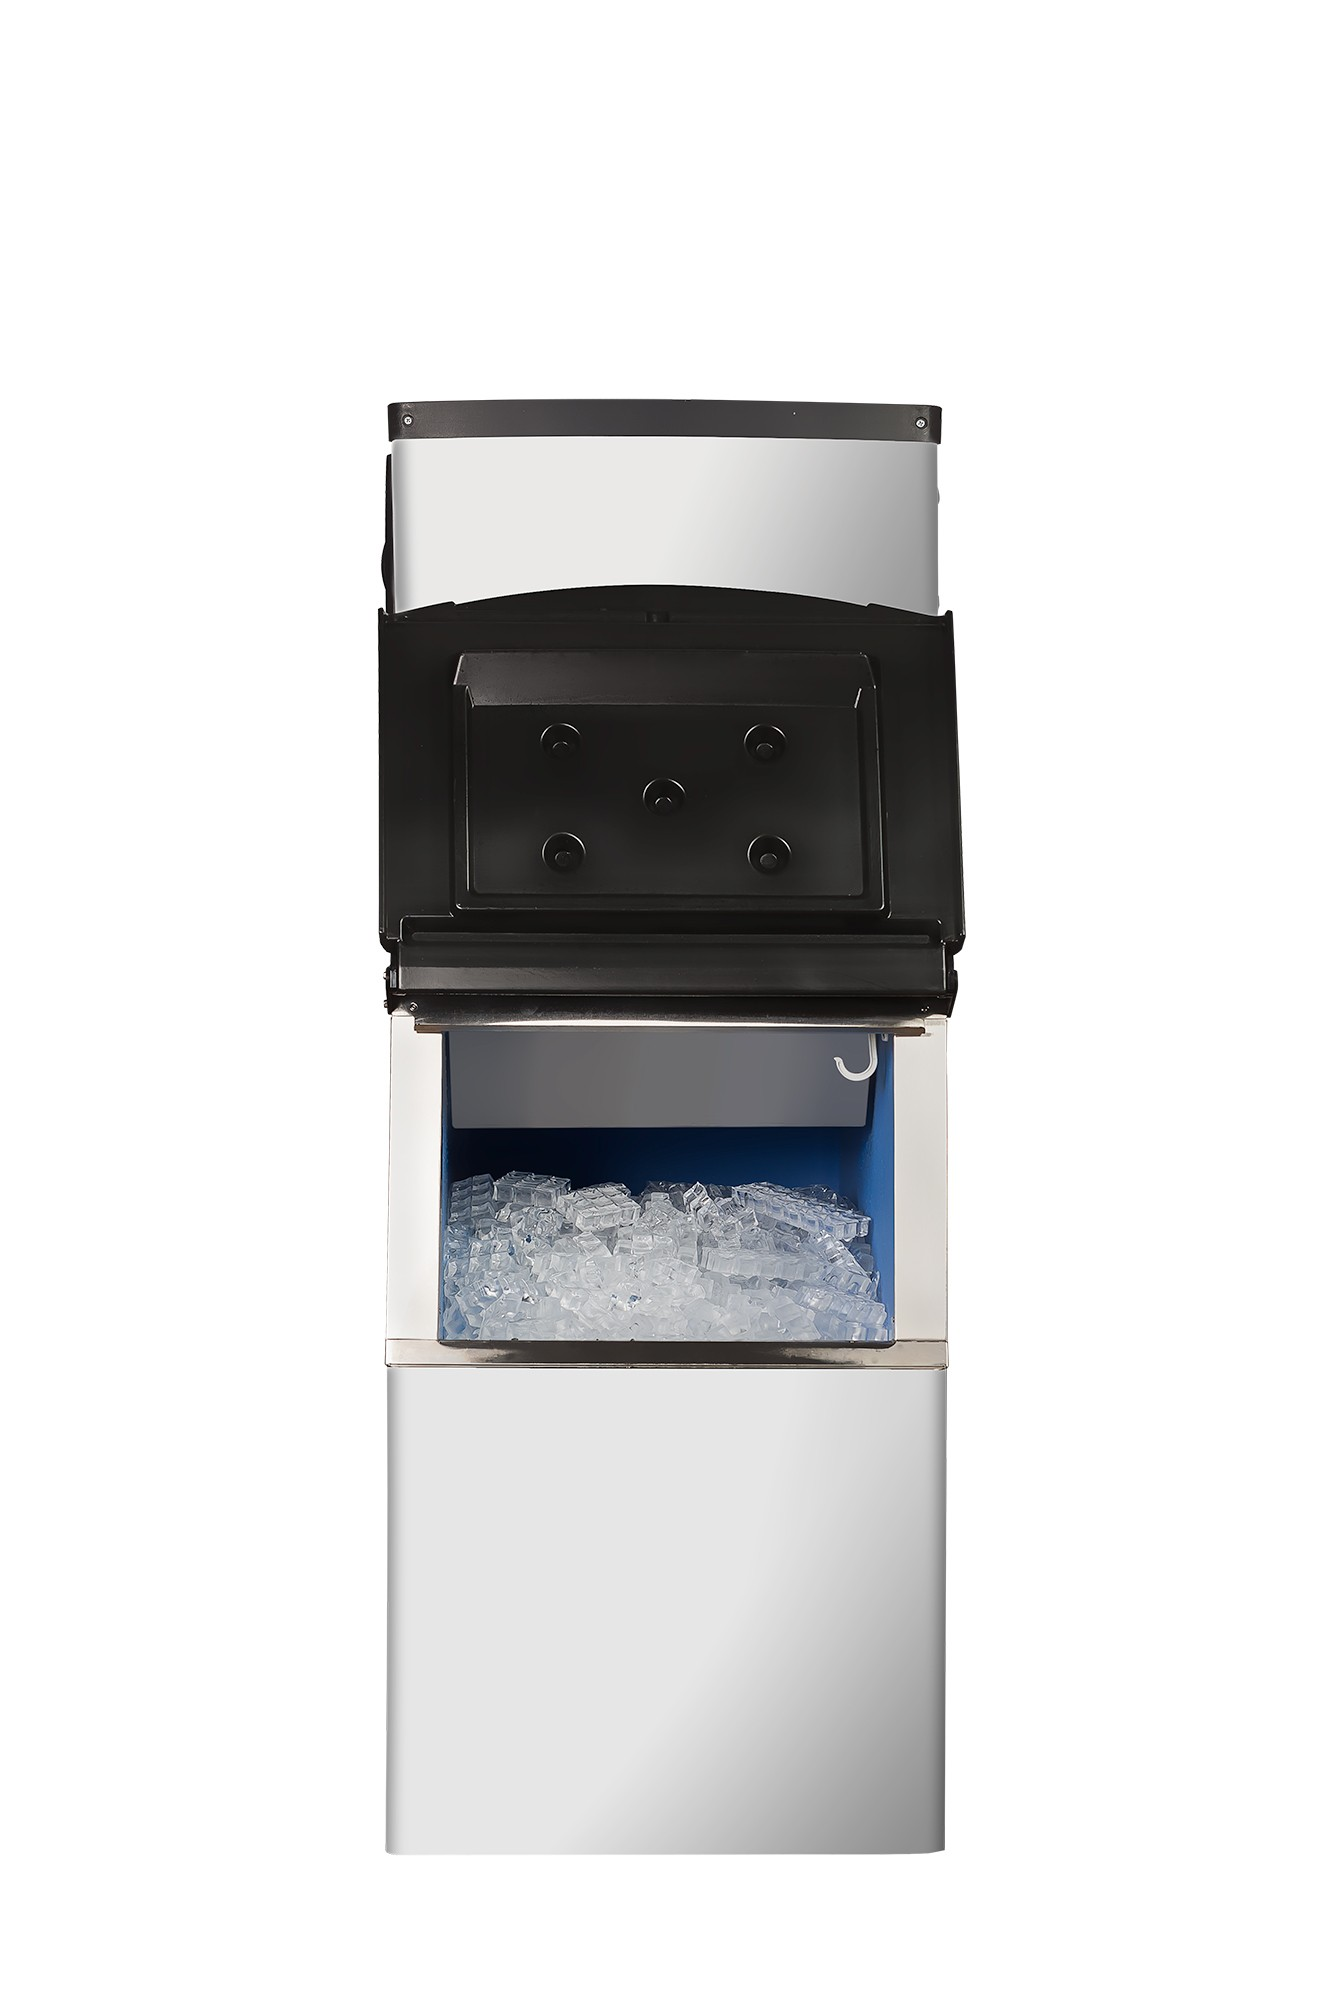 MÁQUINA DE GELO BENMAX SUPER ICE 160/90 KG - 220V